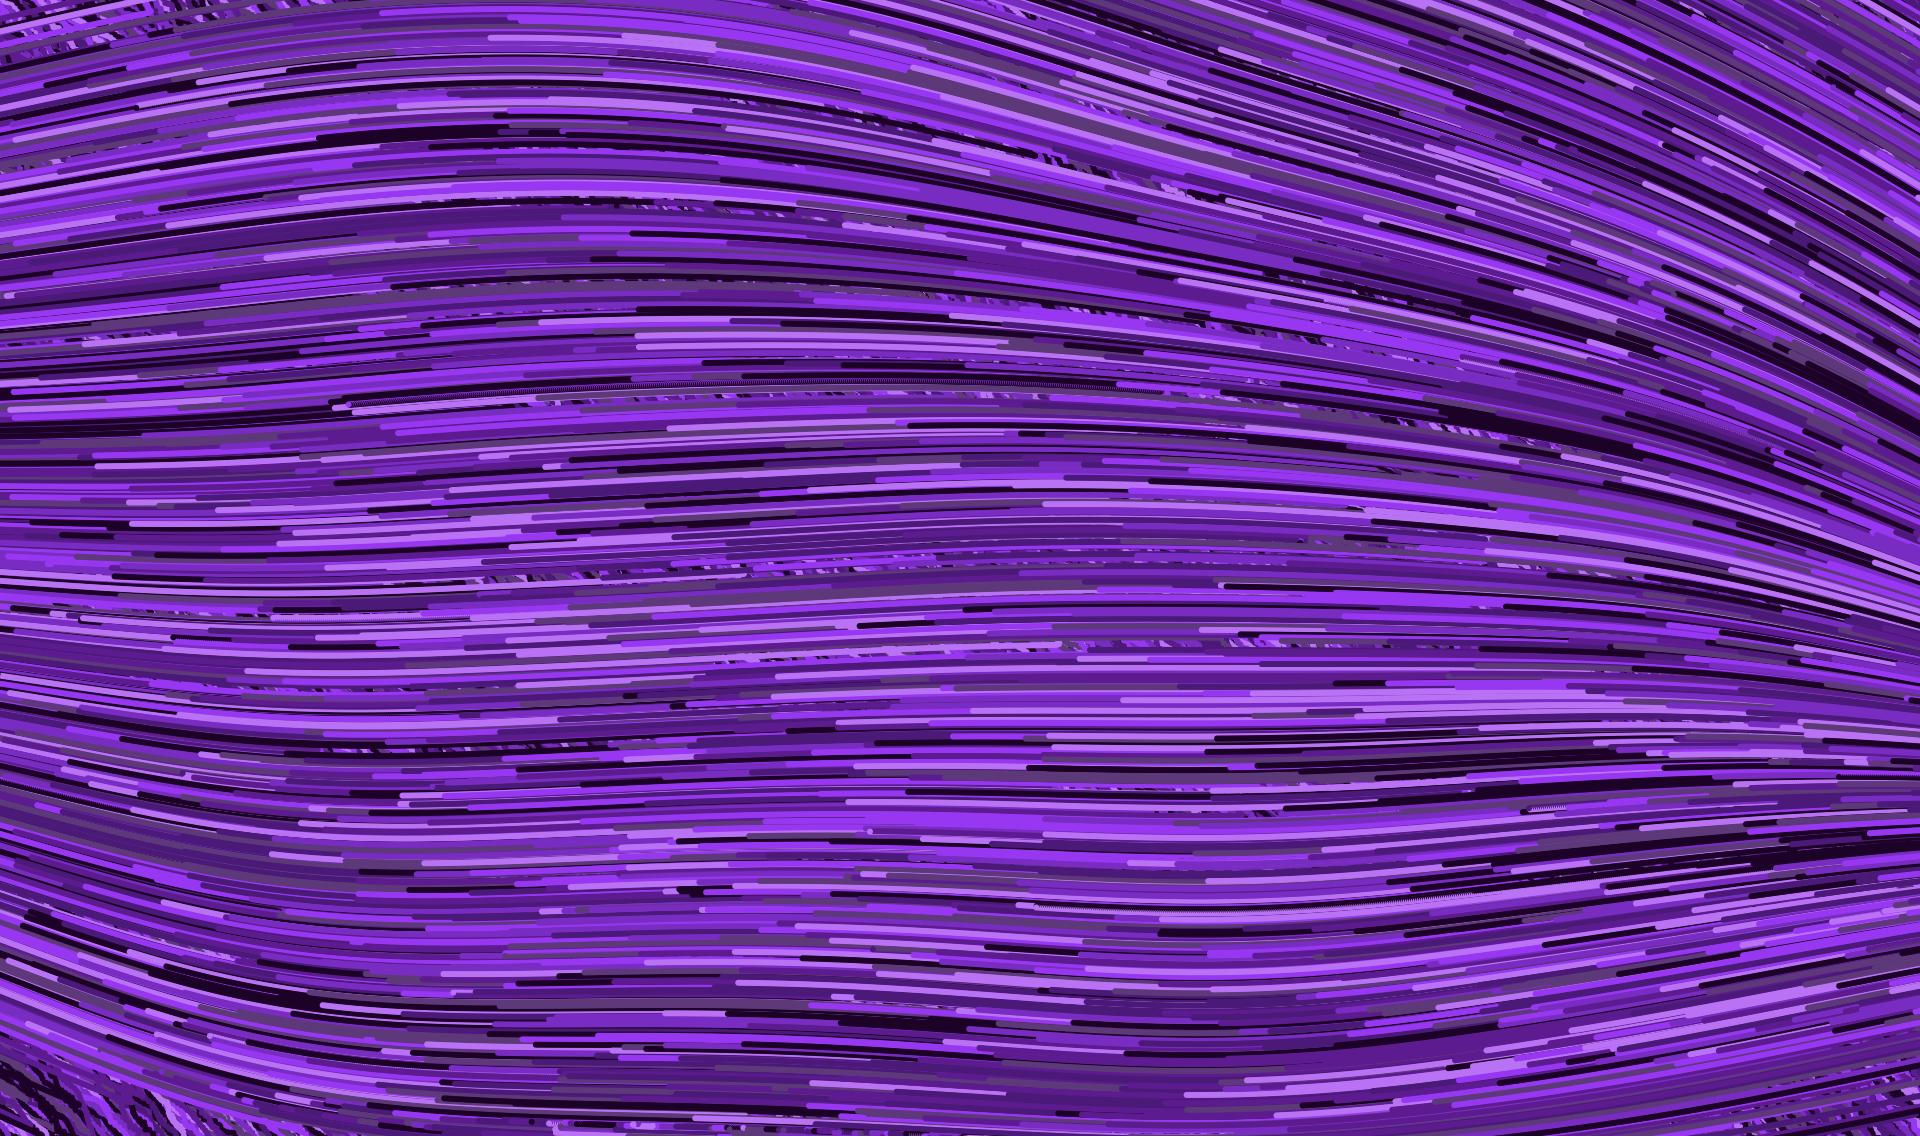 calm, flowy, converging lines